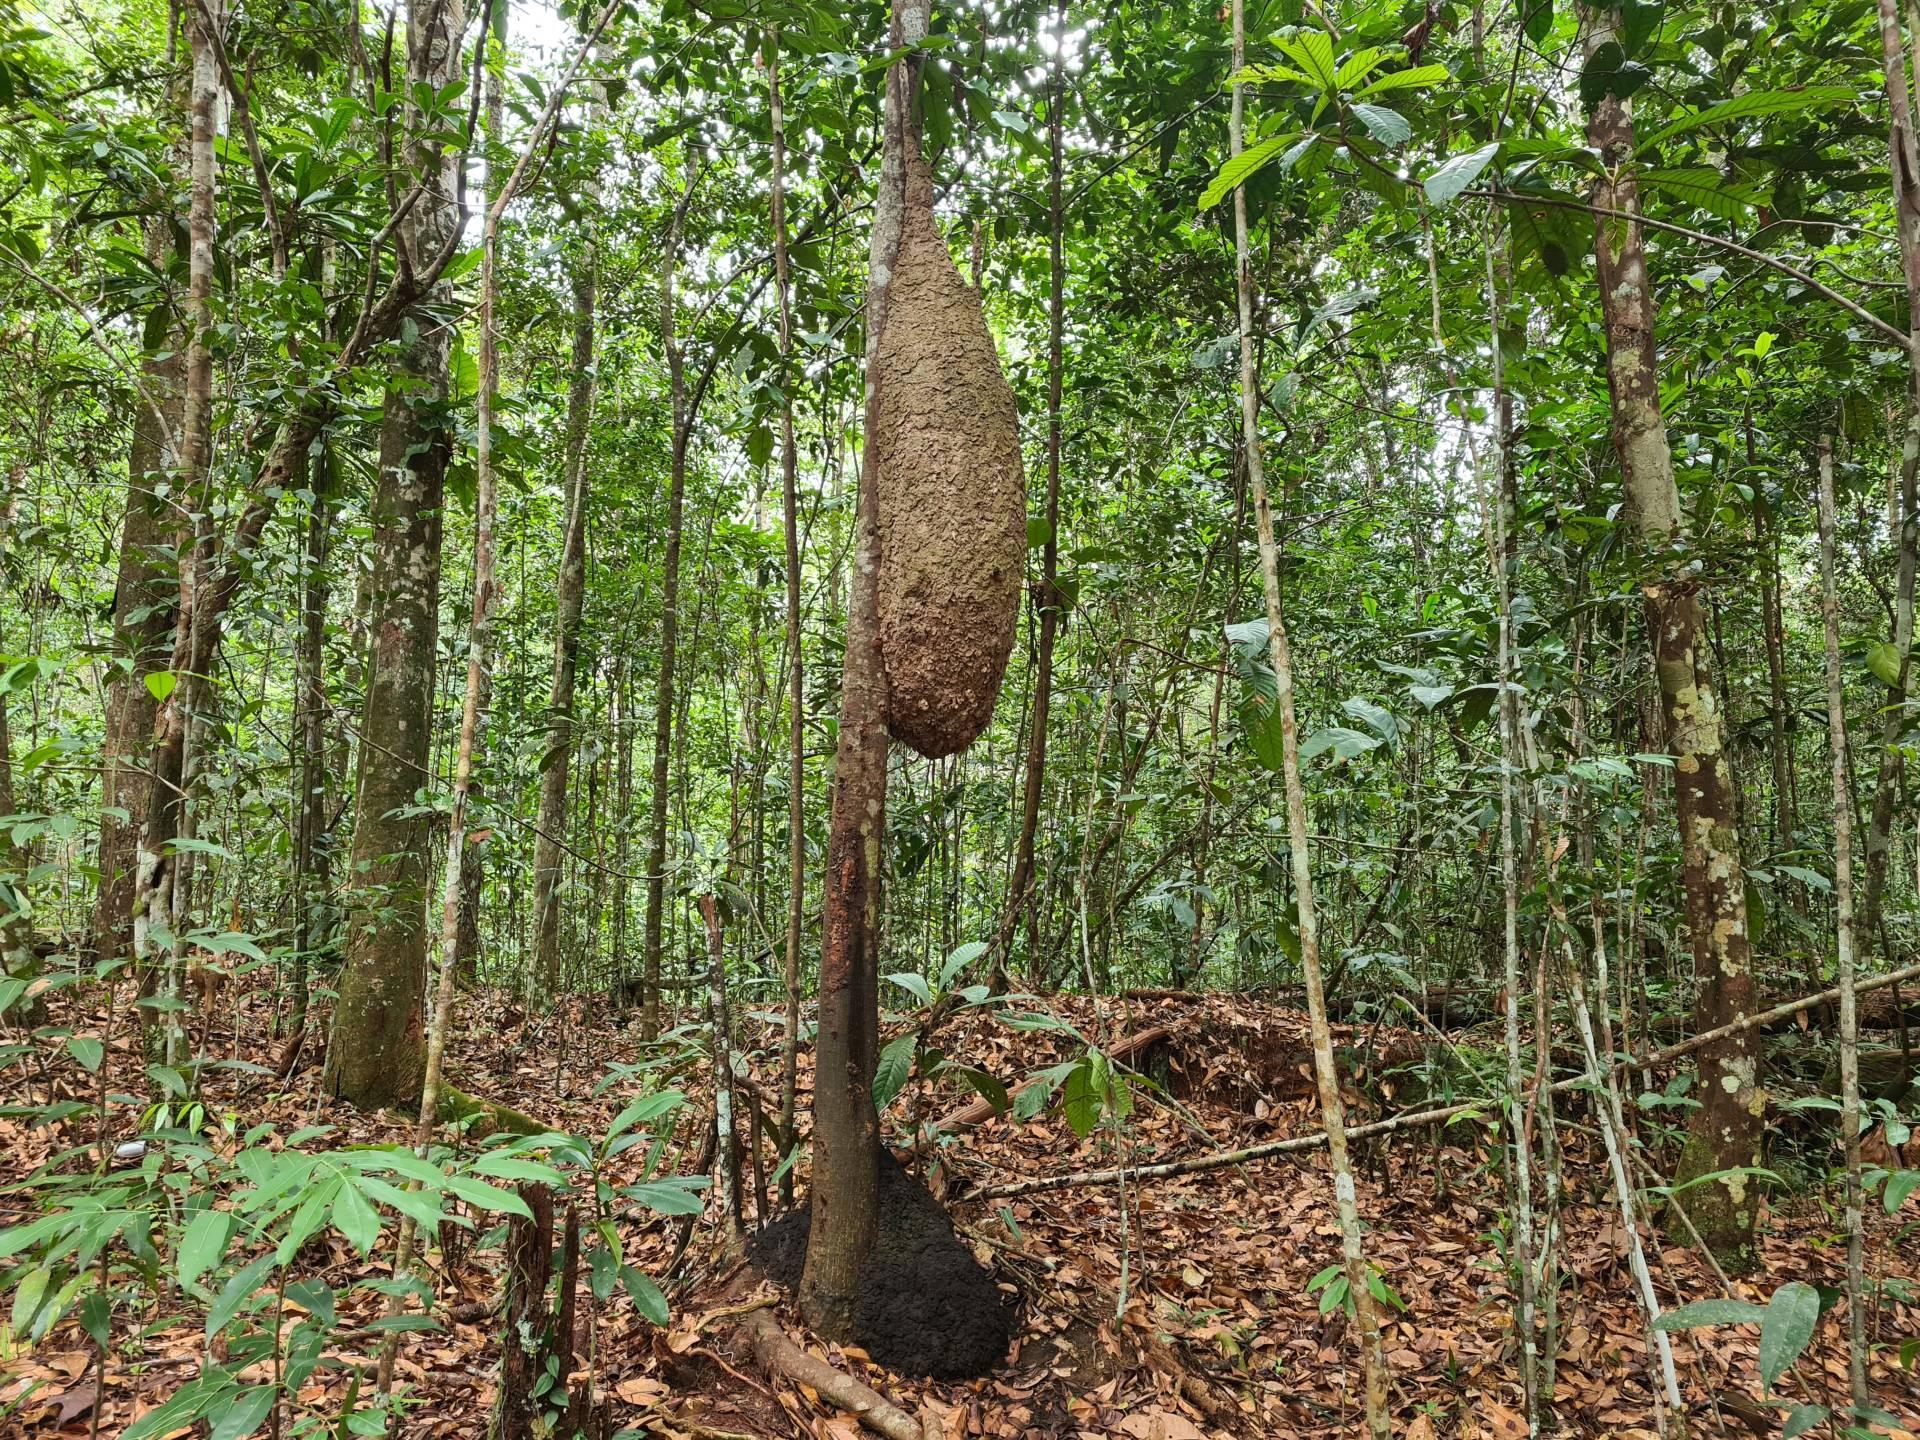 муравейник на дереве, Бразилия